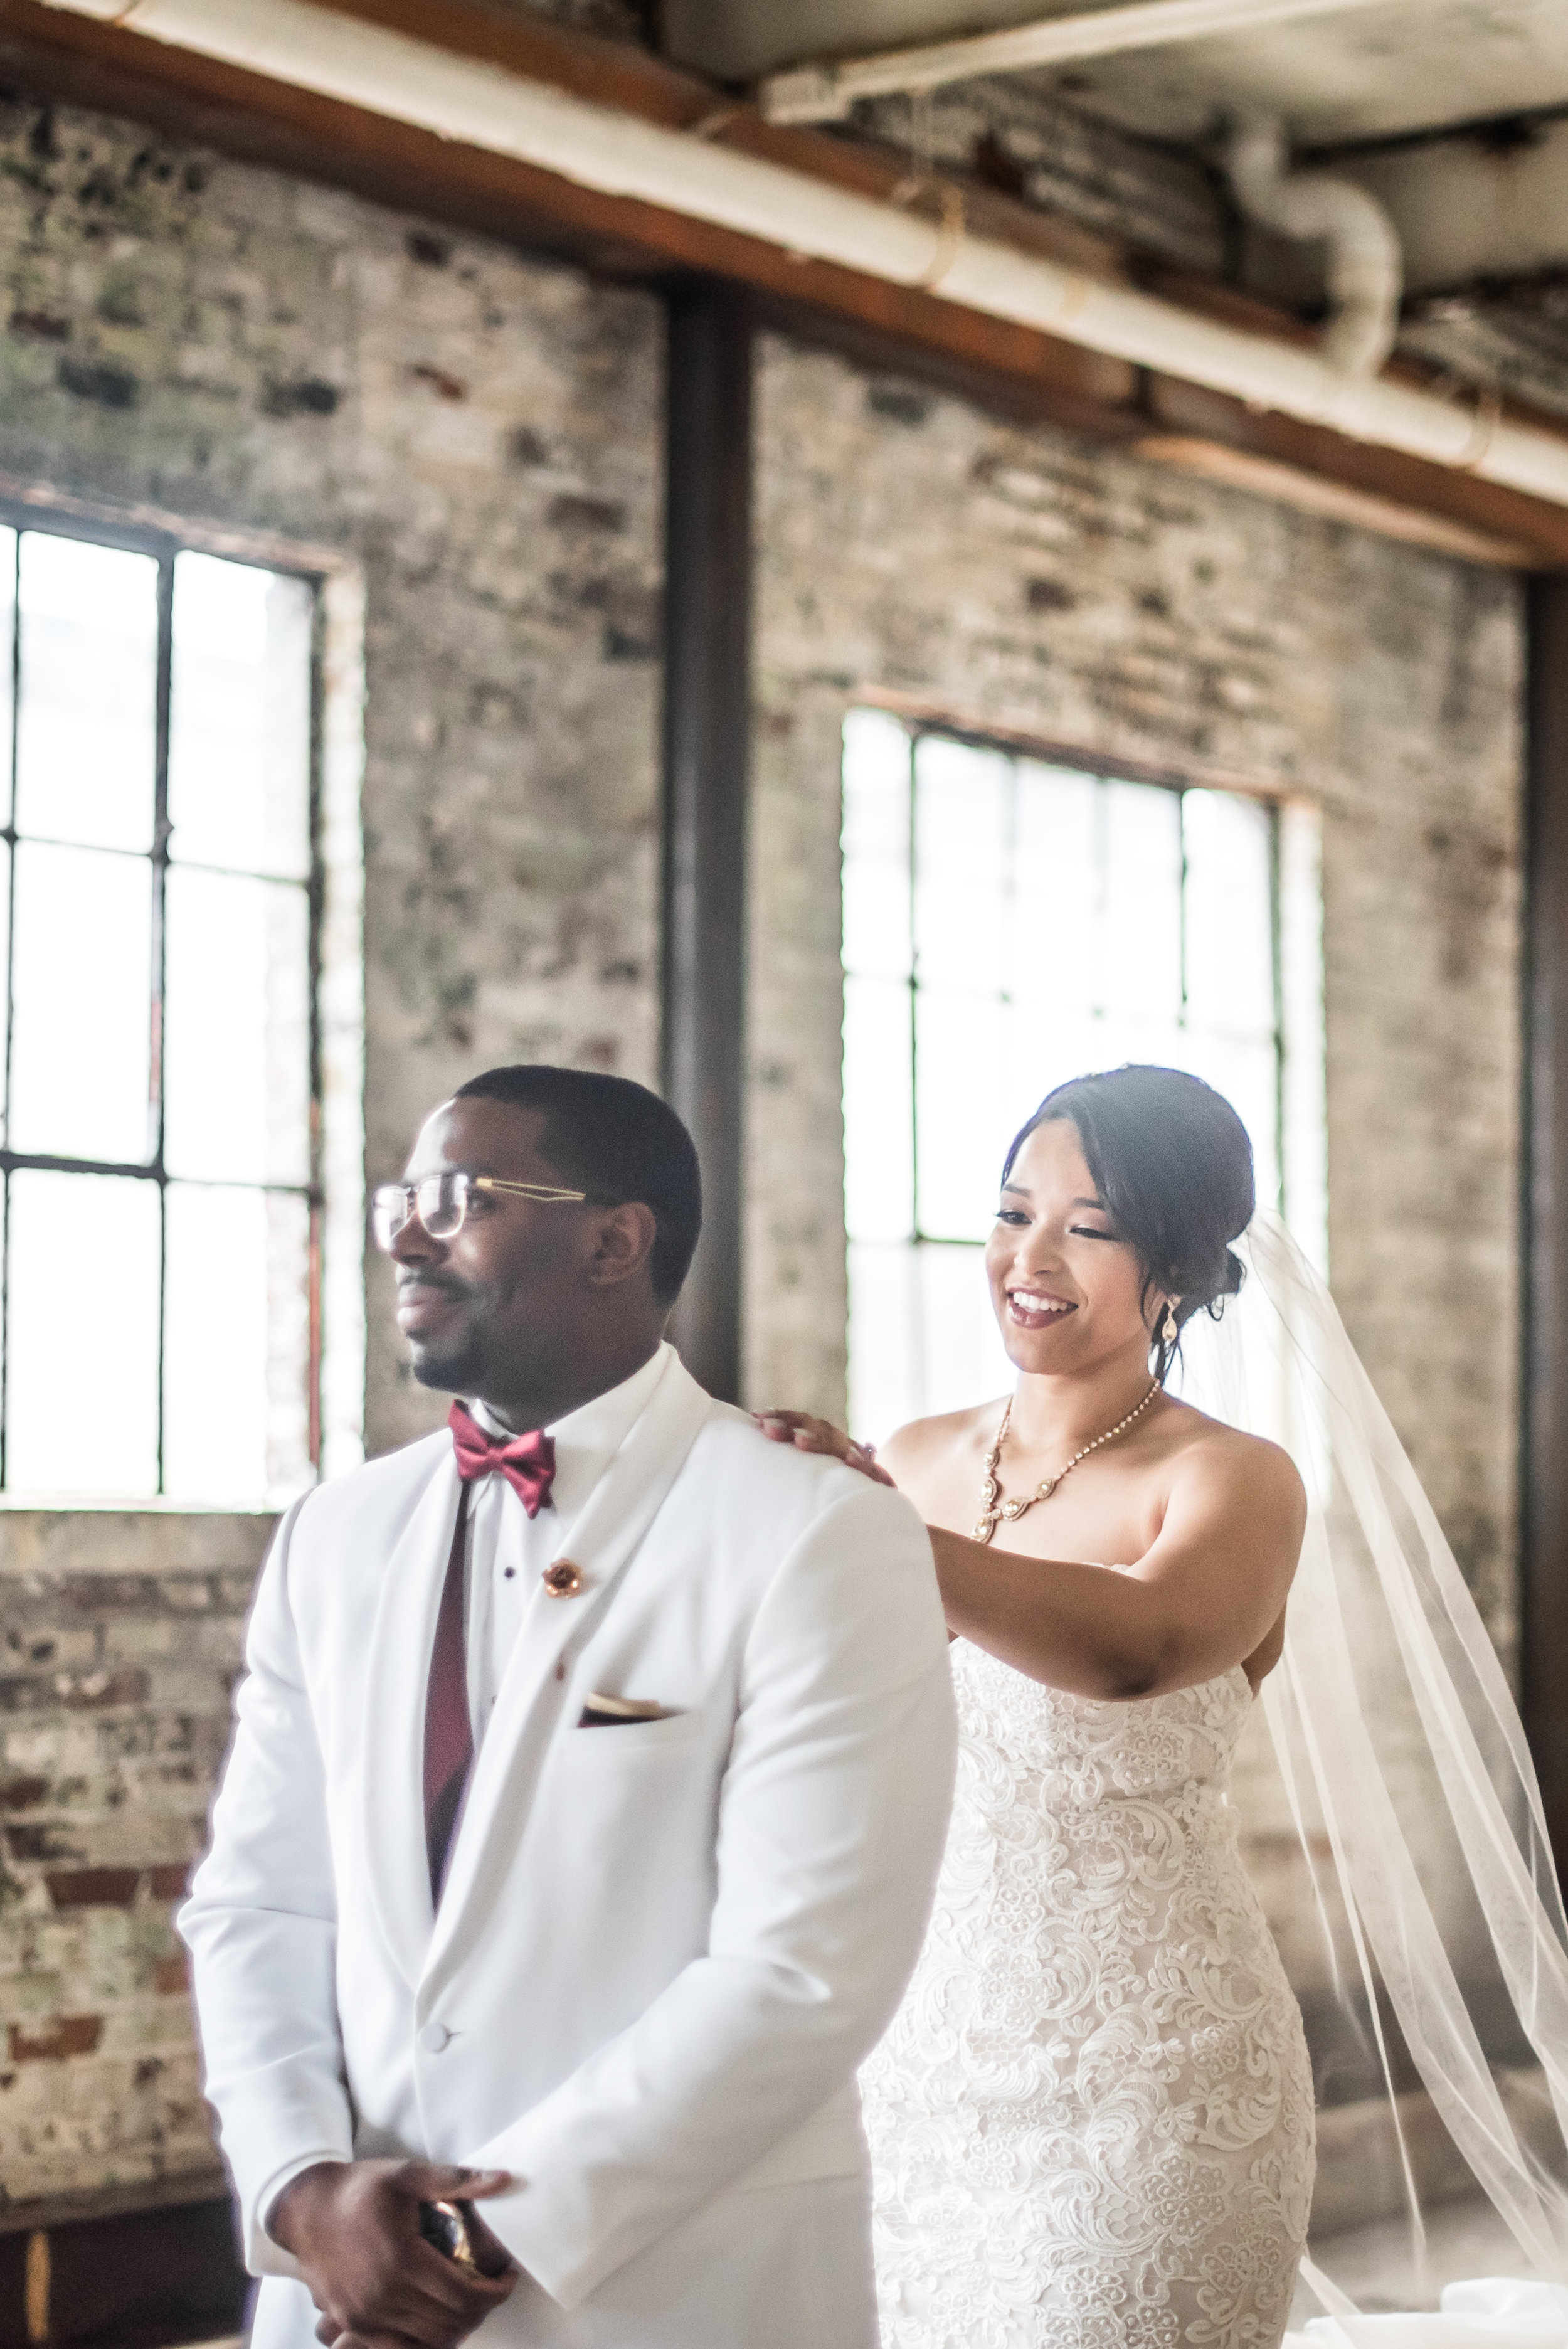 Burlington Iowa Wedding Midwest Photographer Melissa Cervantes _ Chantelle and Isaiah 104c.jpg